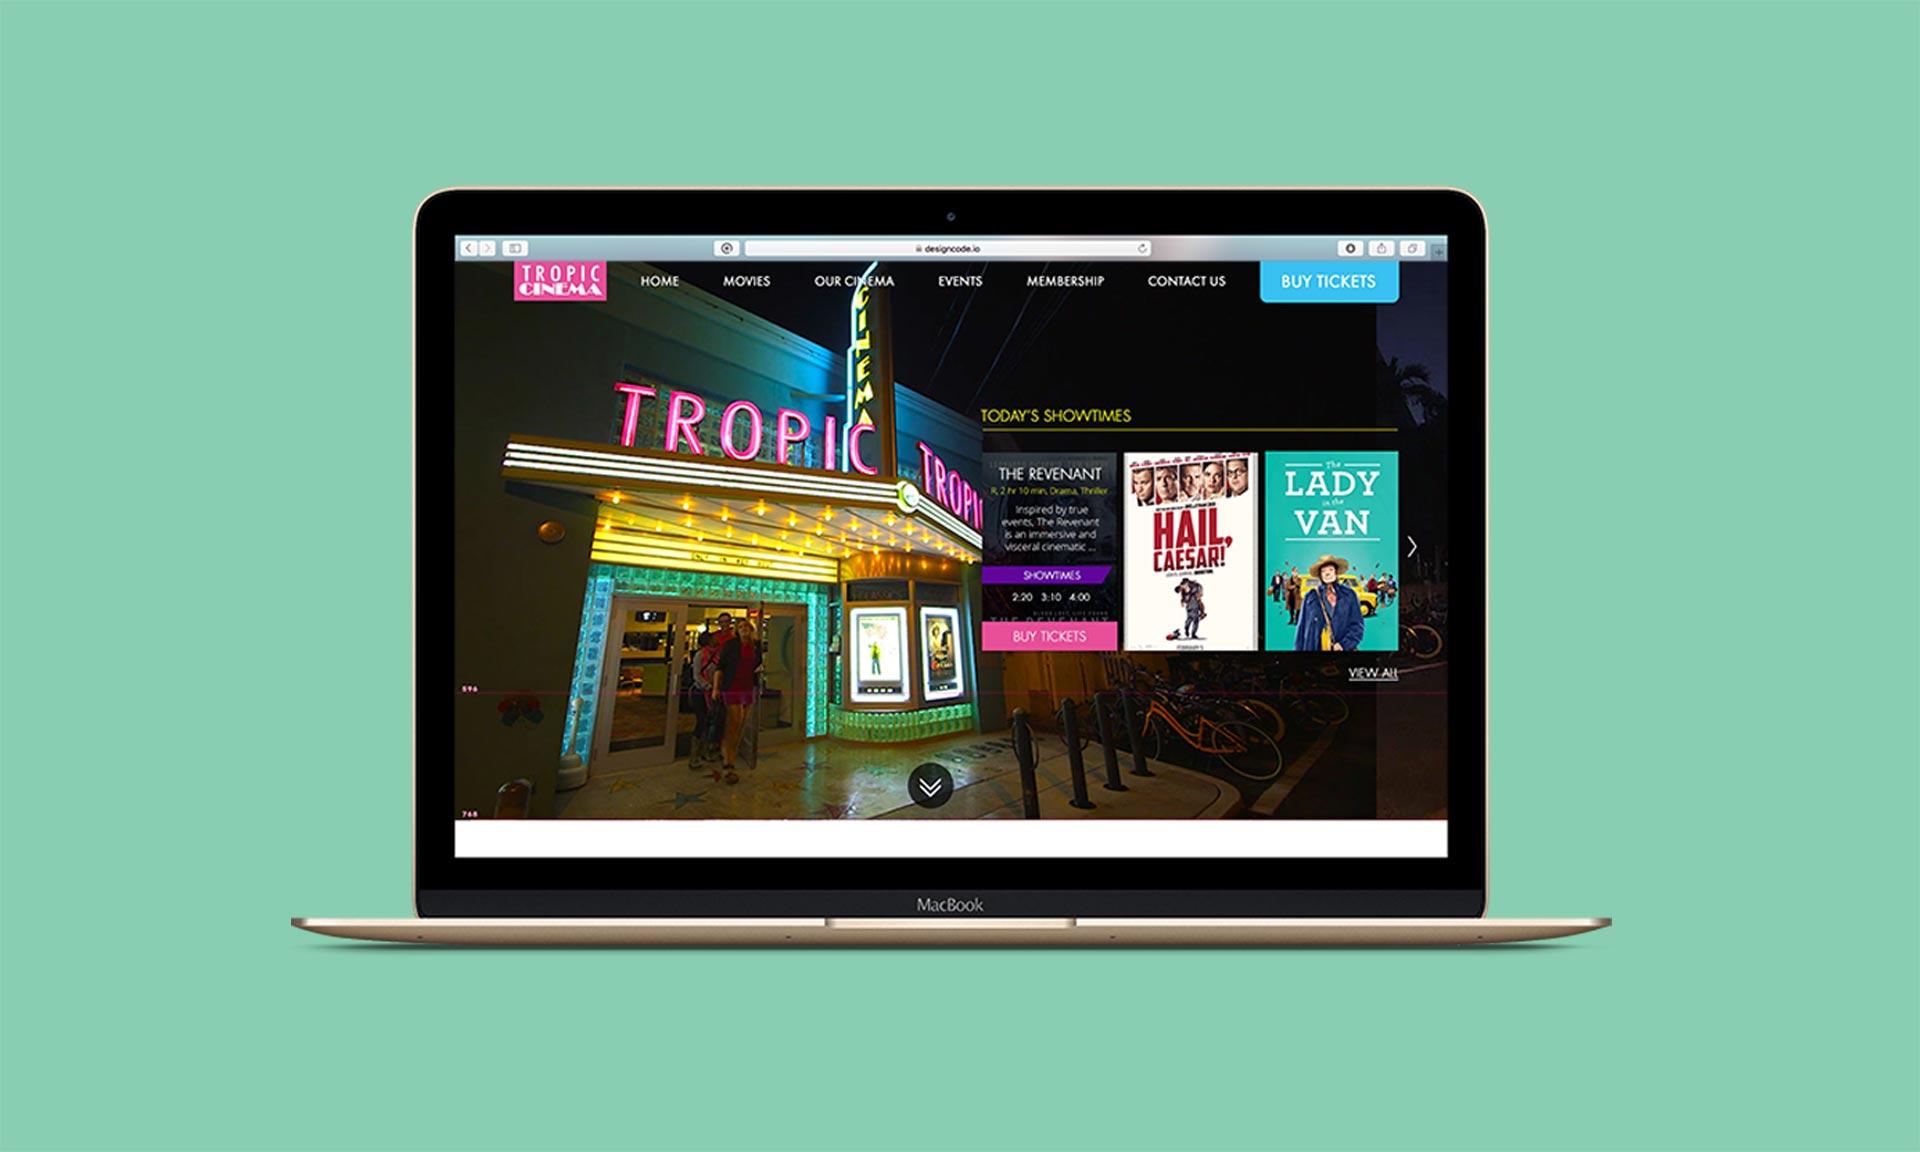 Tropical Cinema Laptop